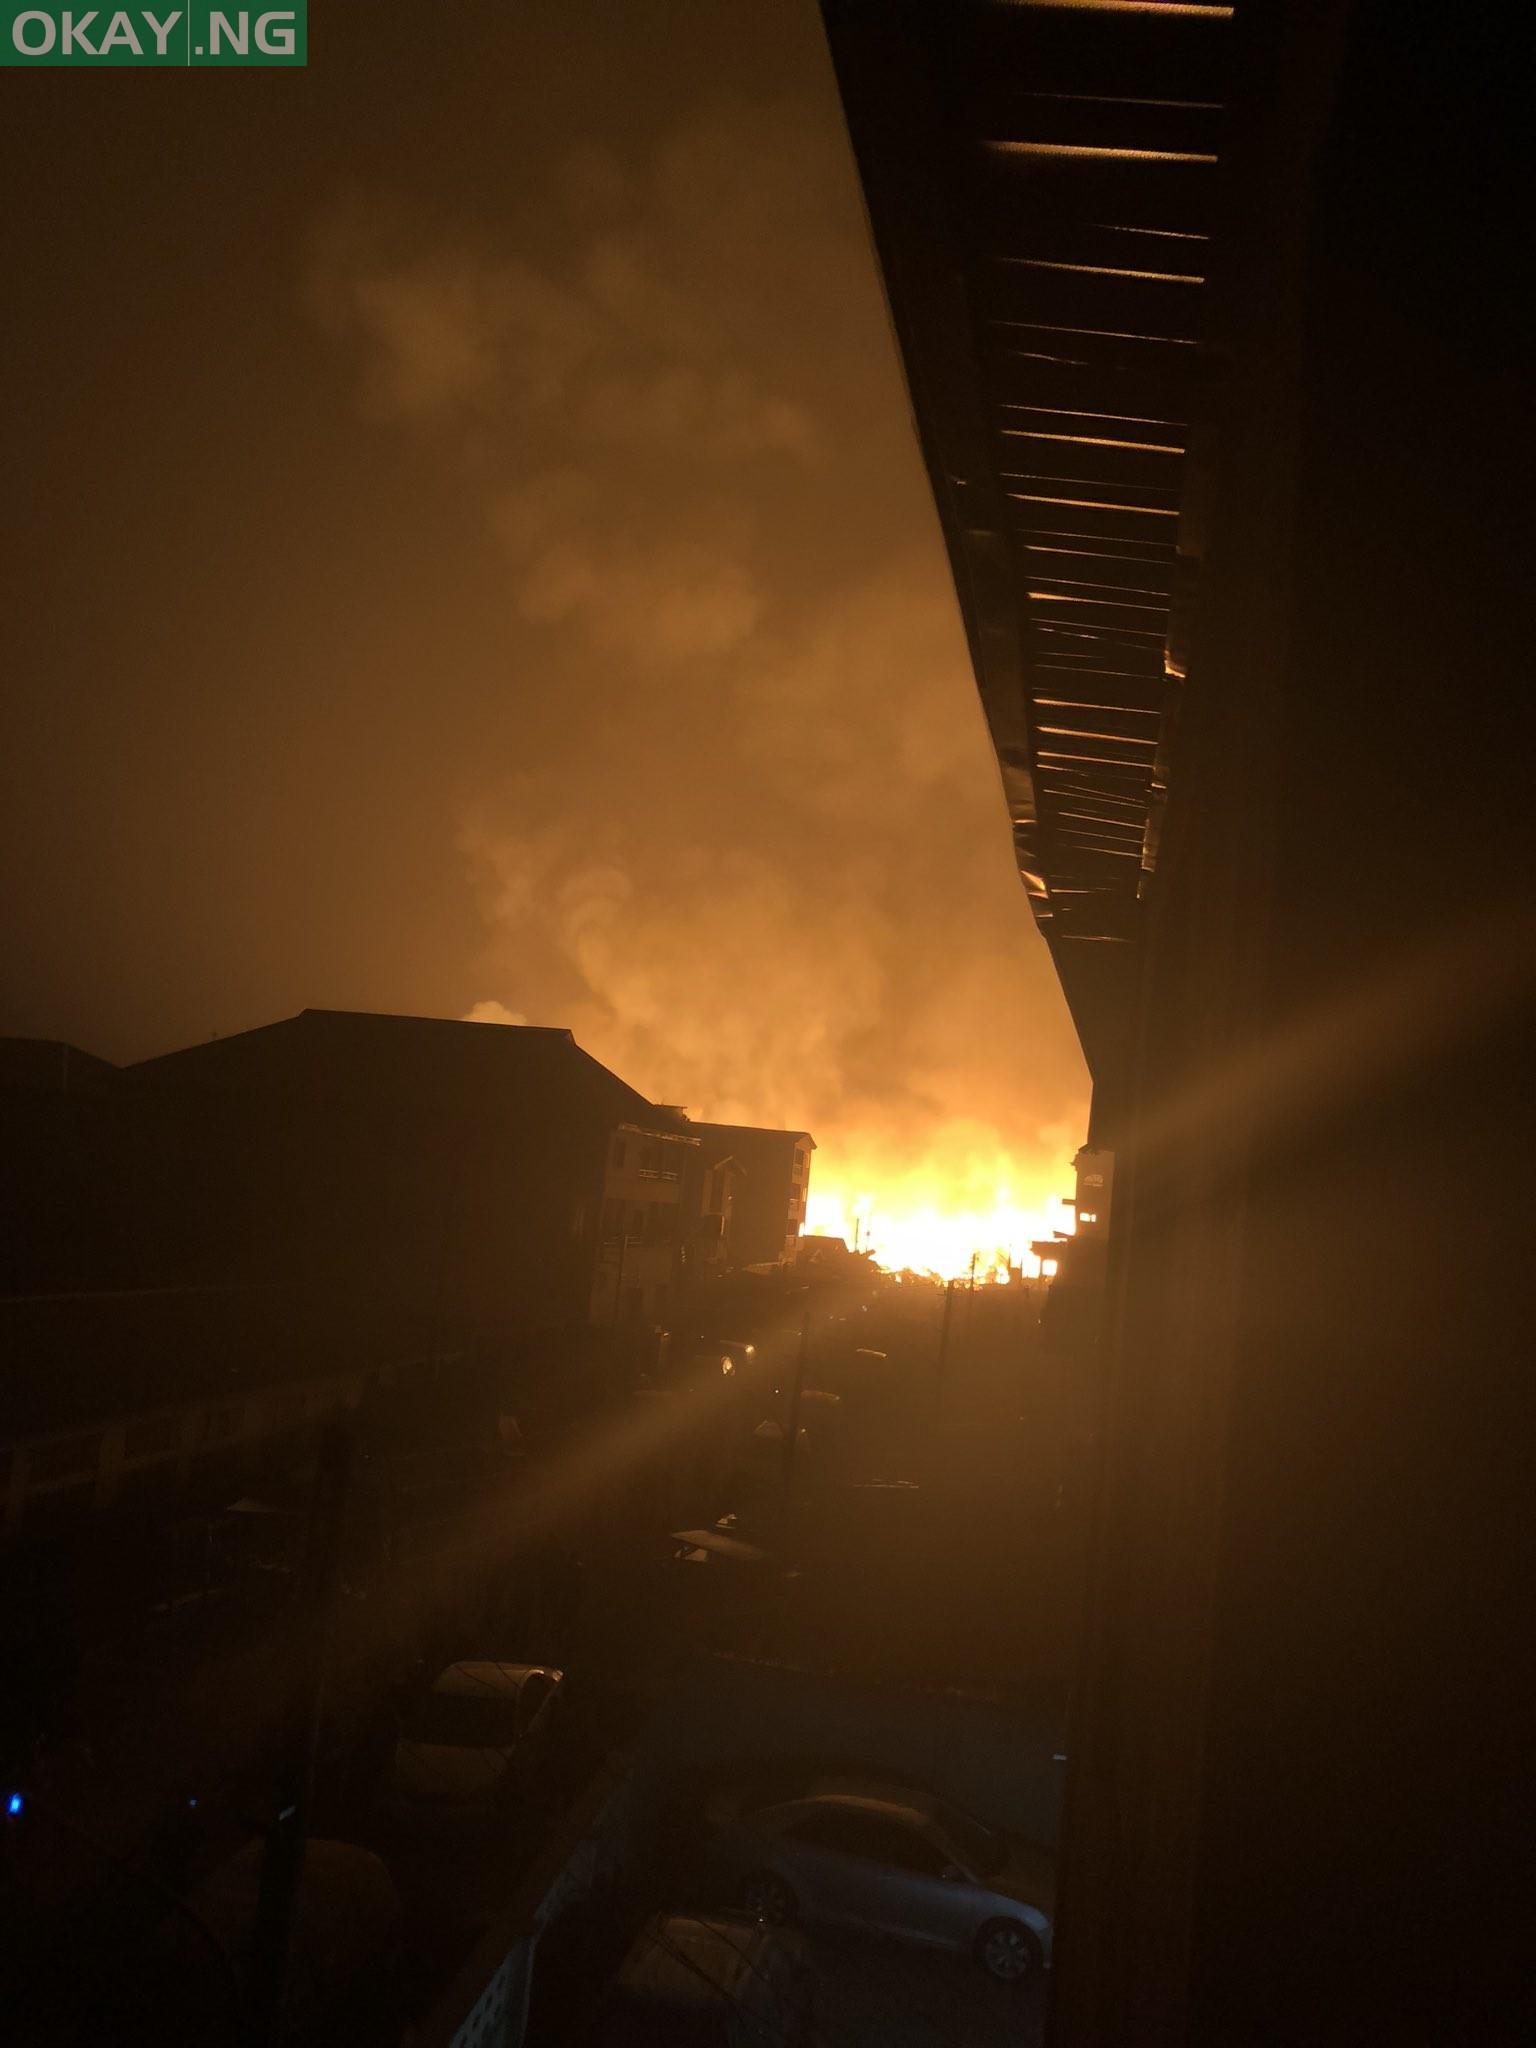 Fire at Amu timber market in Mushin